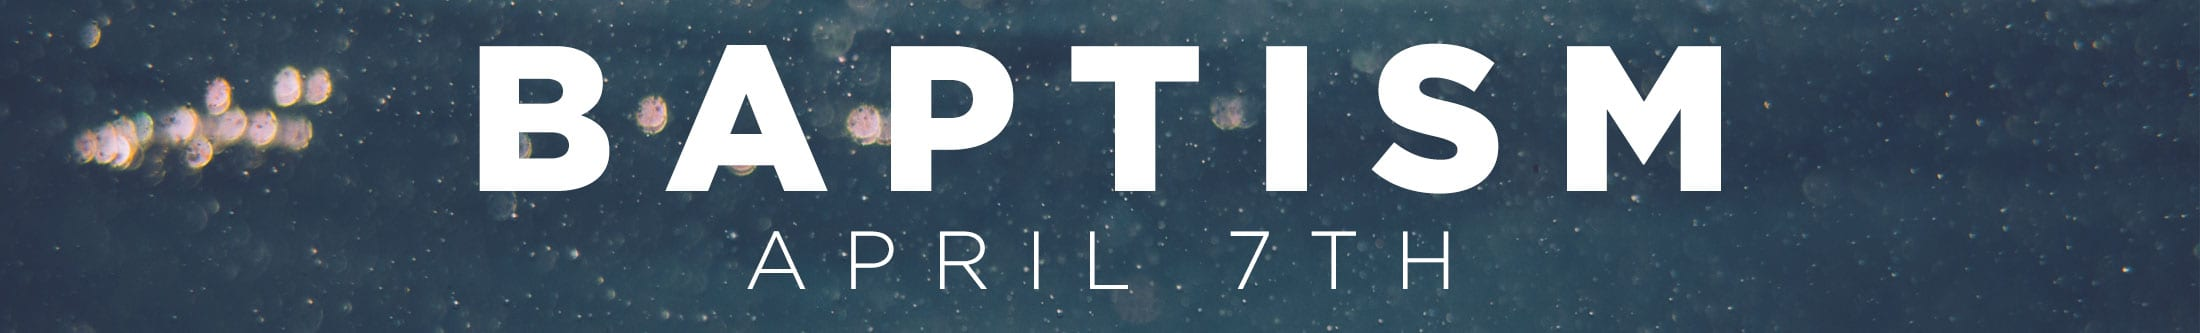 Baptism April 7th 2019